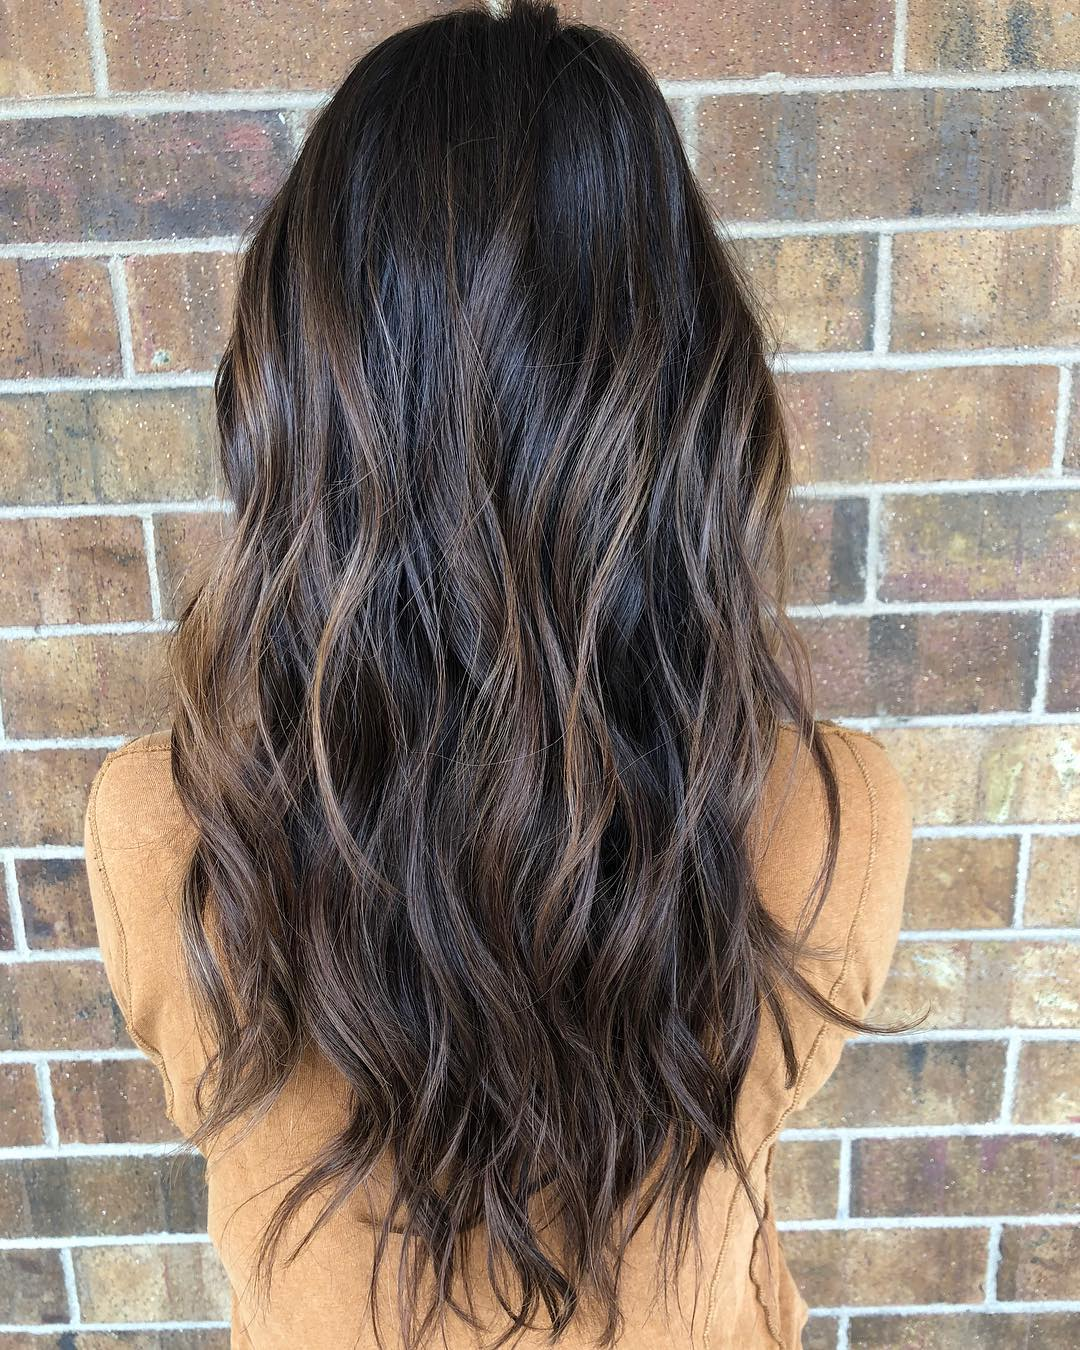 Hair We Love October 29th - November 4th 2018